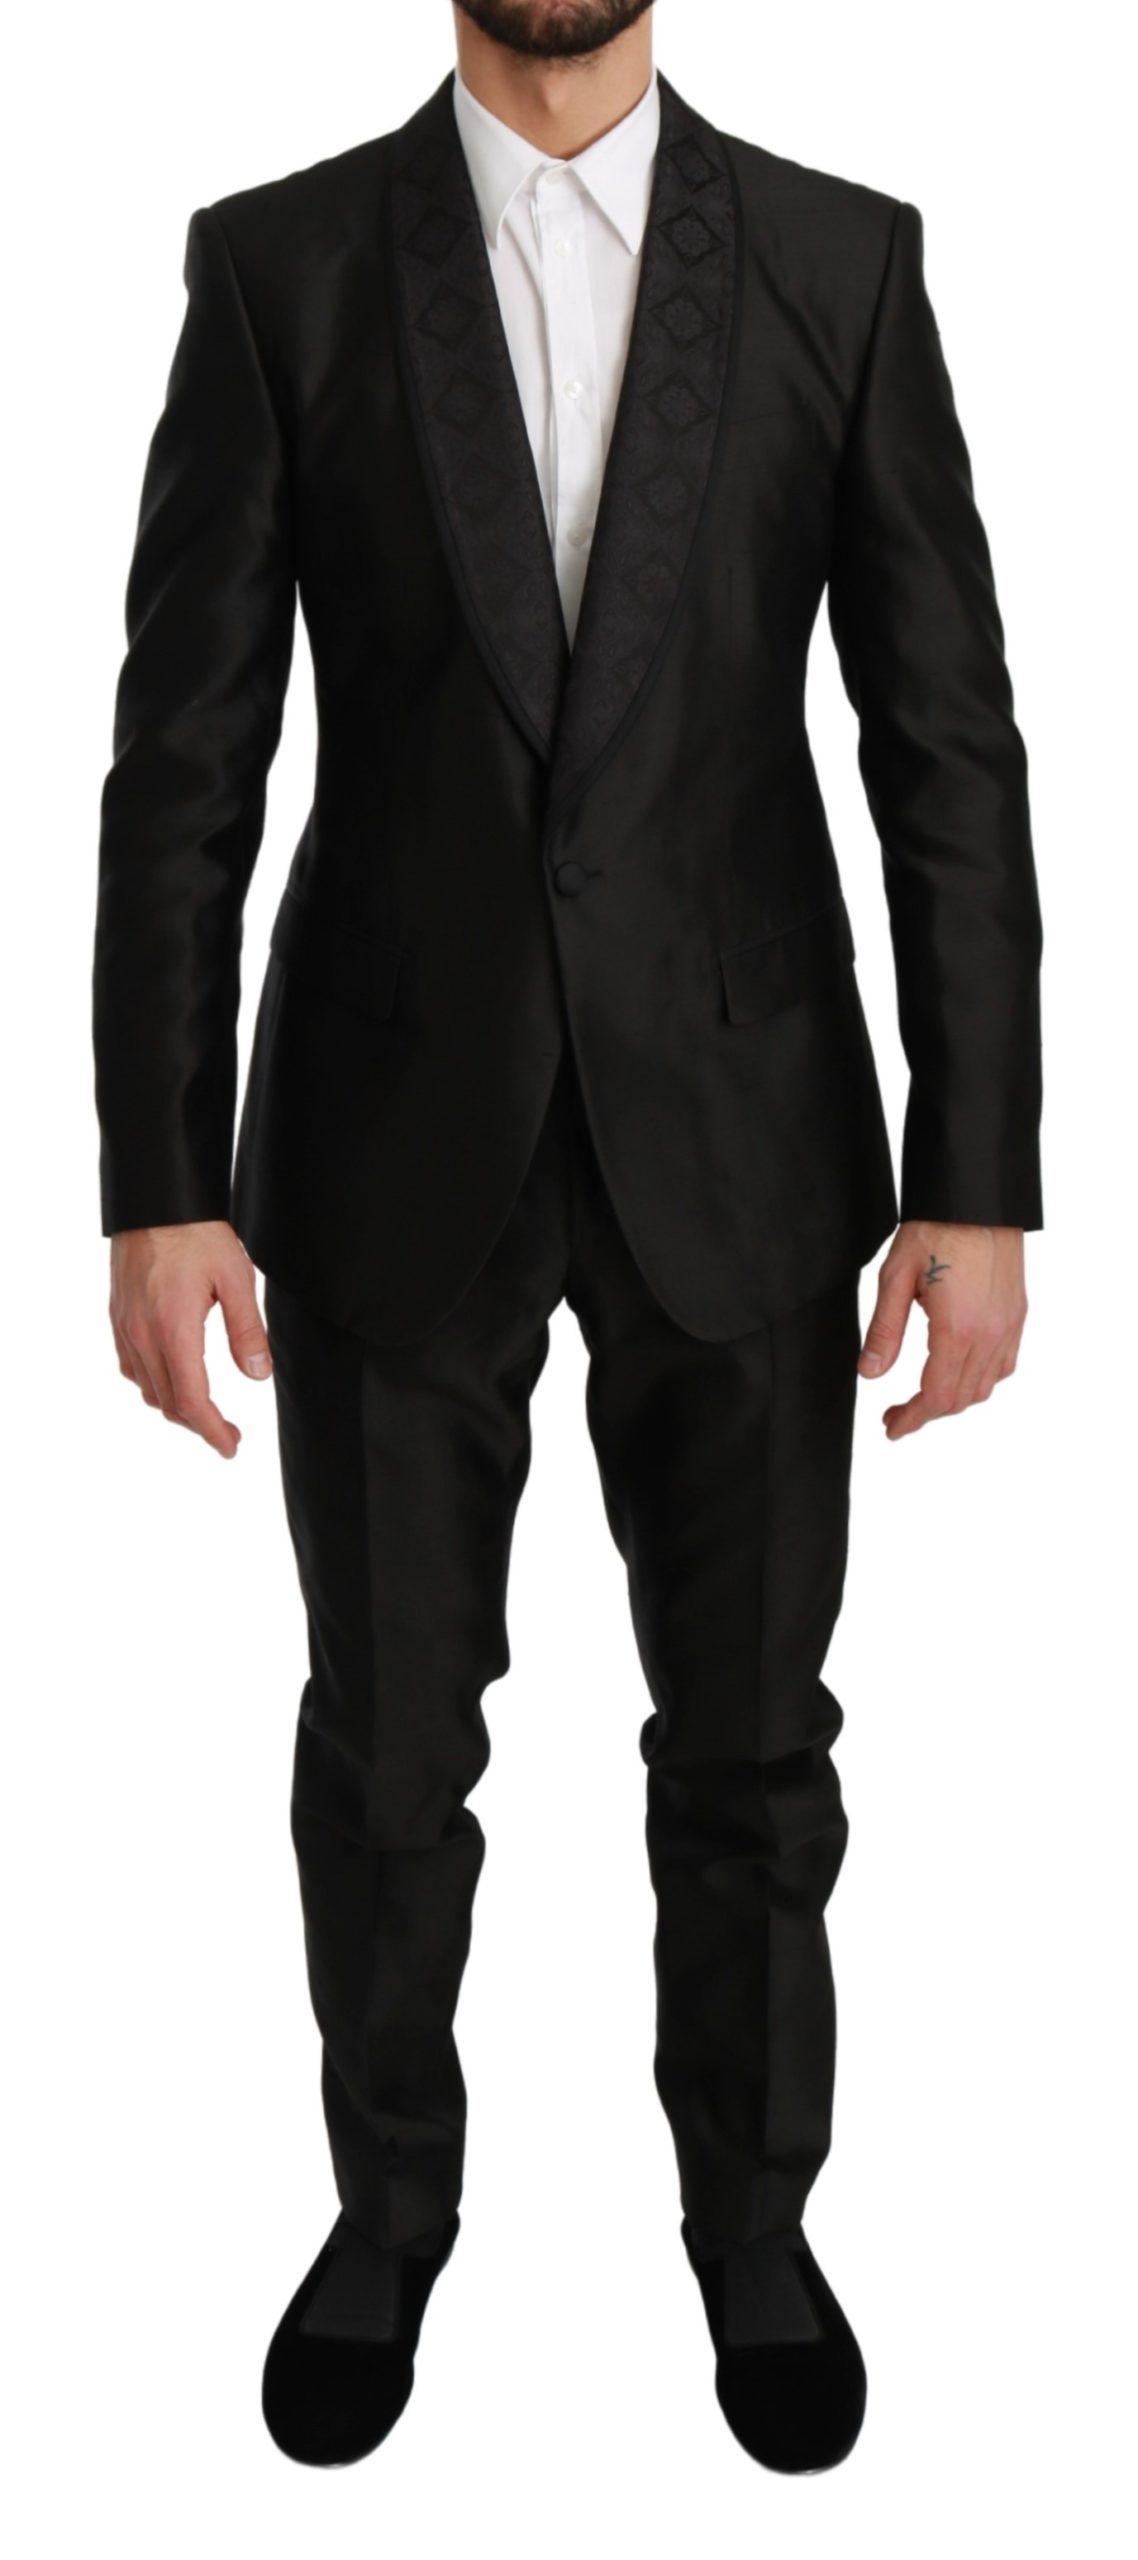 Dolce & Gabbana Men's Slim Fit 2 Piece MARTINI Silk Suit Black KOS1727 - IT48   M